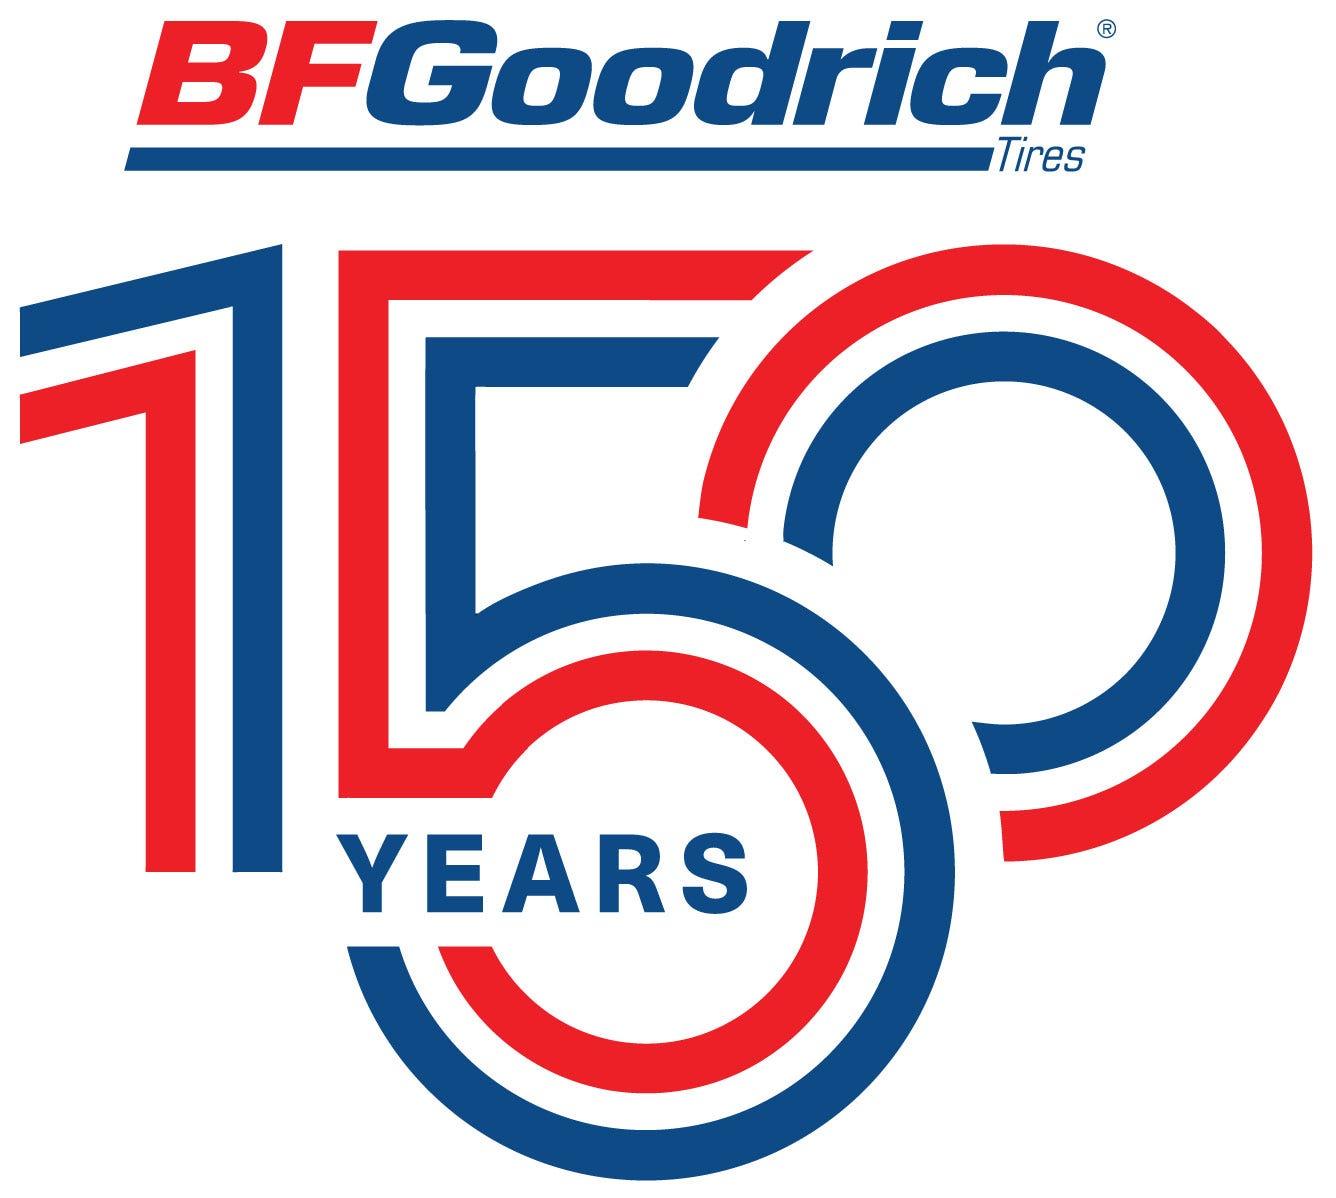 BFGoodrich® is Celebration 150 Years